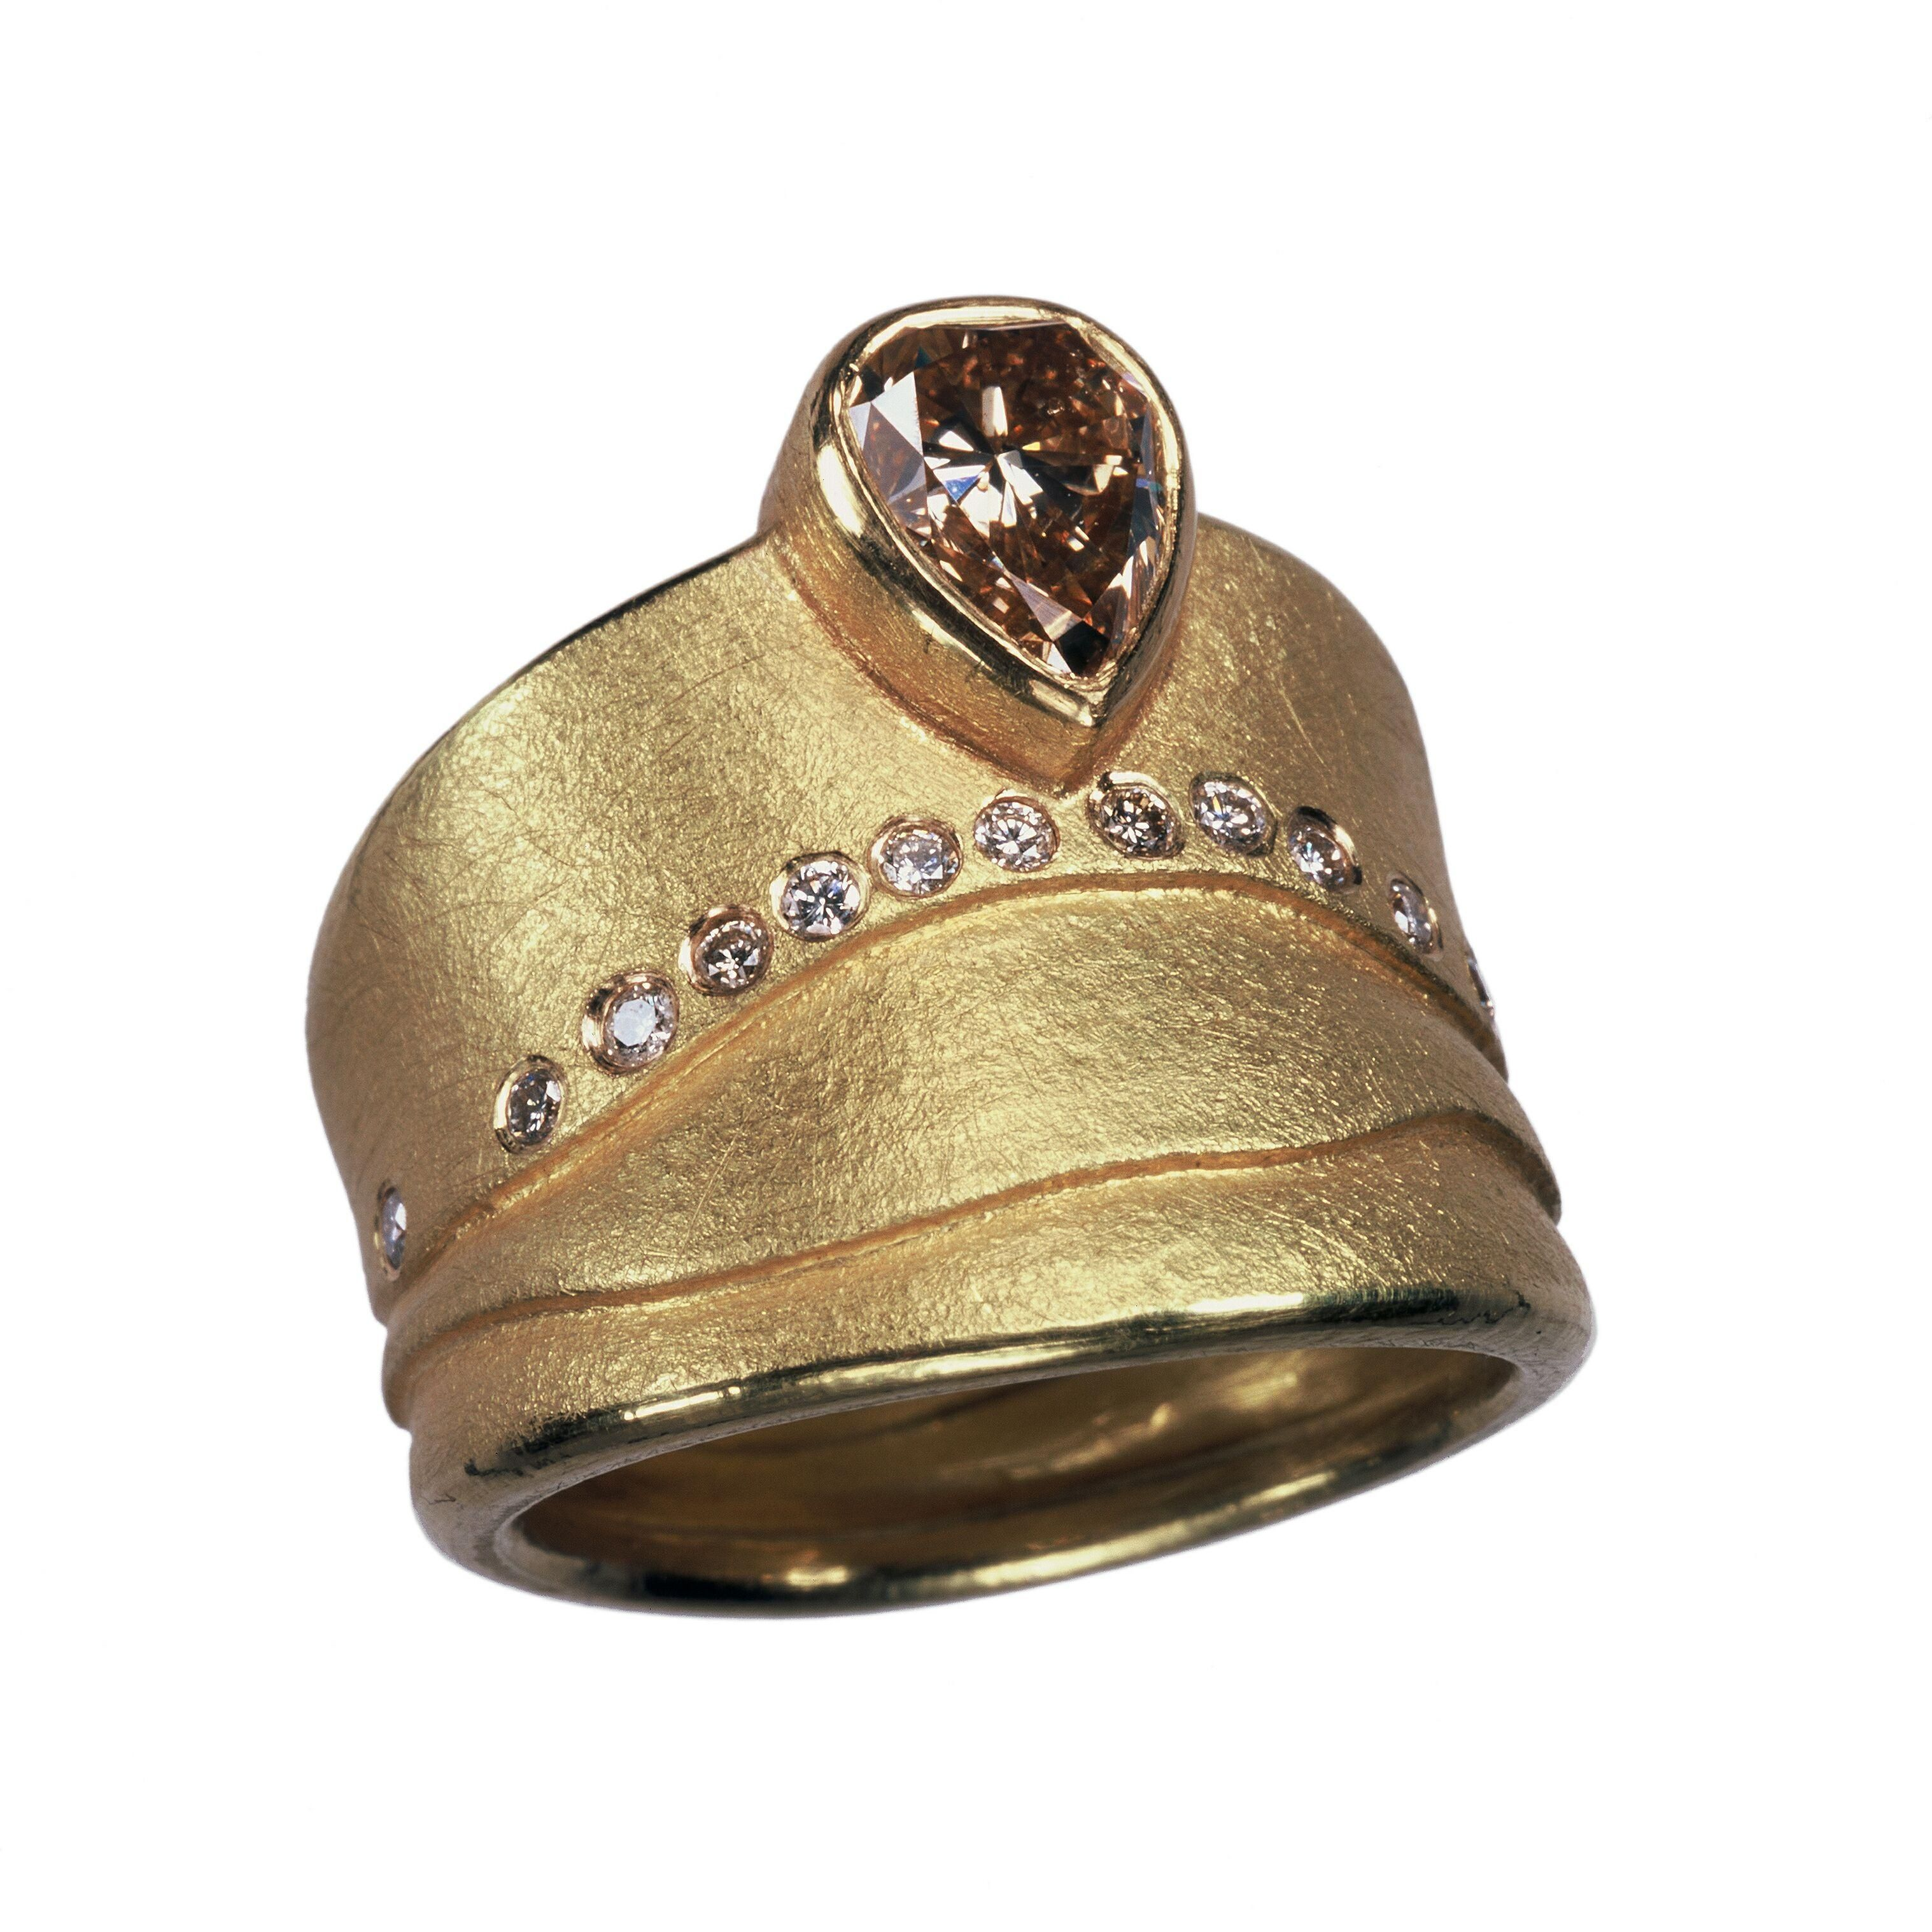 ring from Michael Zobel - Schmuckatelier - Konstanz